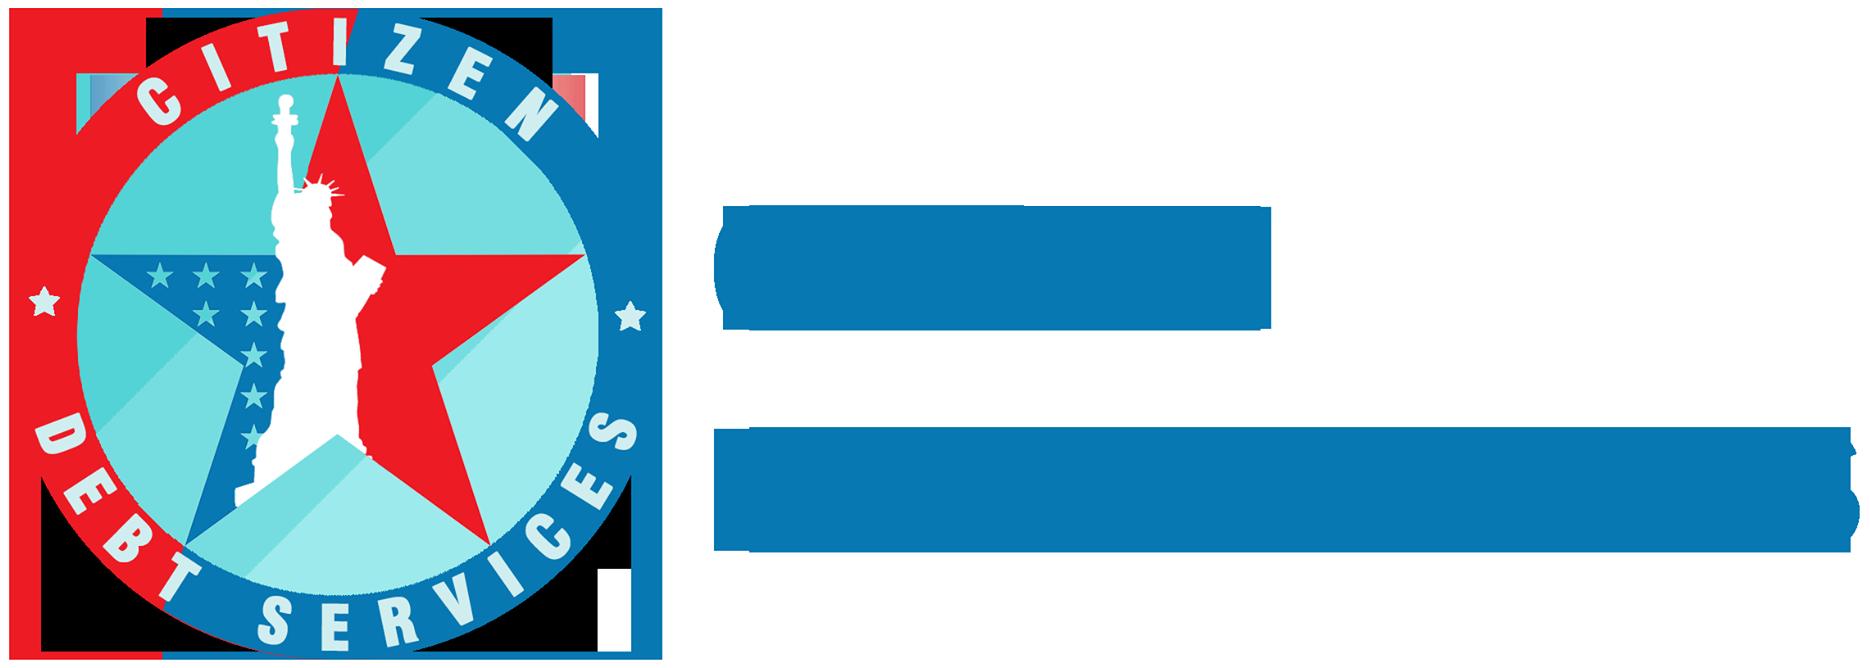 Citizen Debt Services